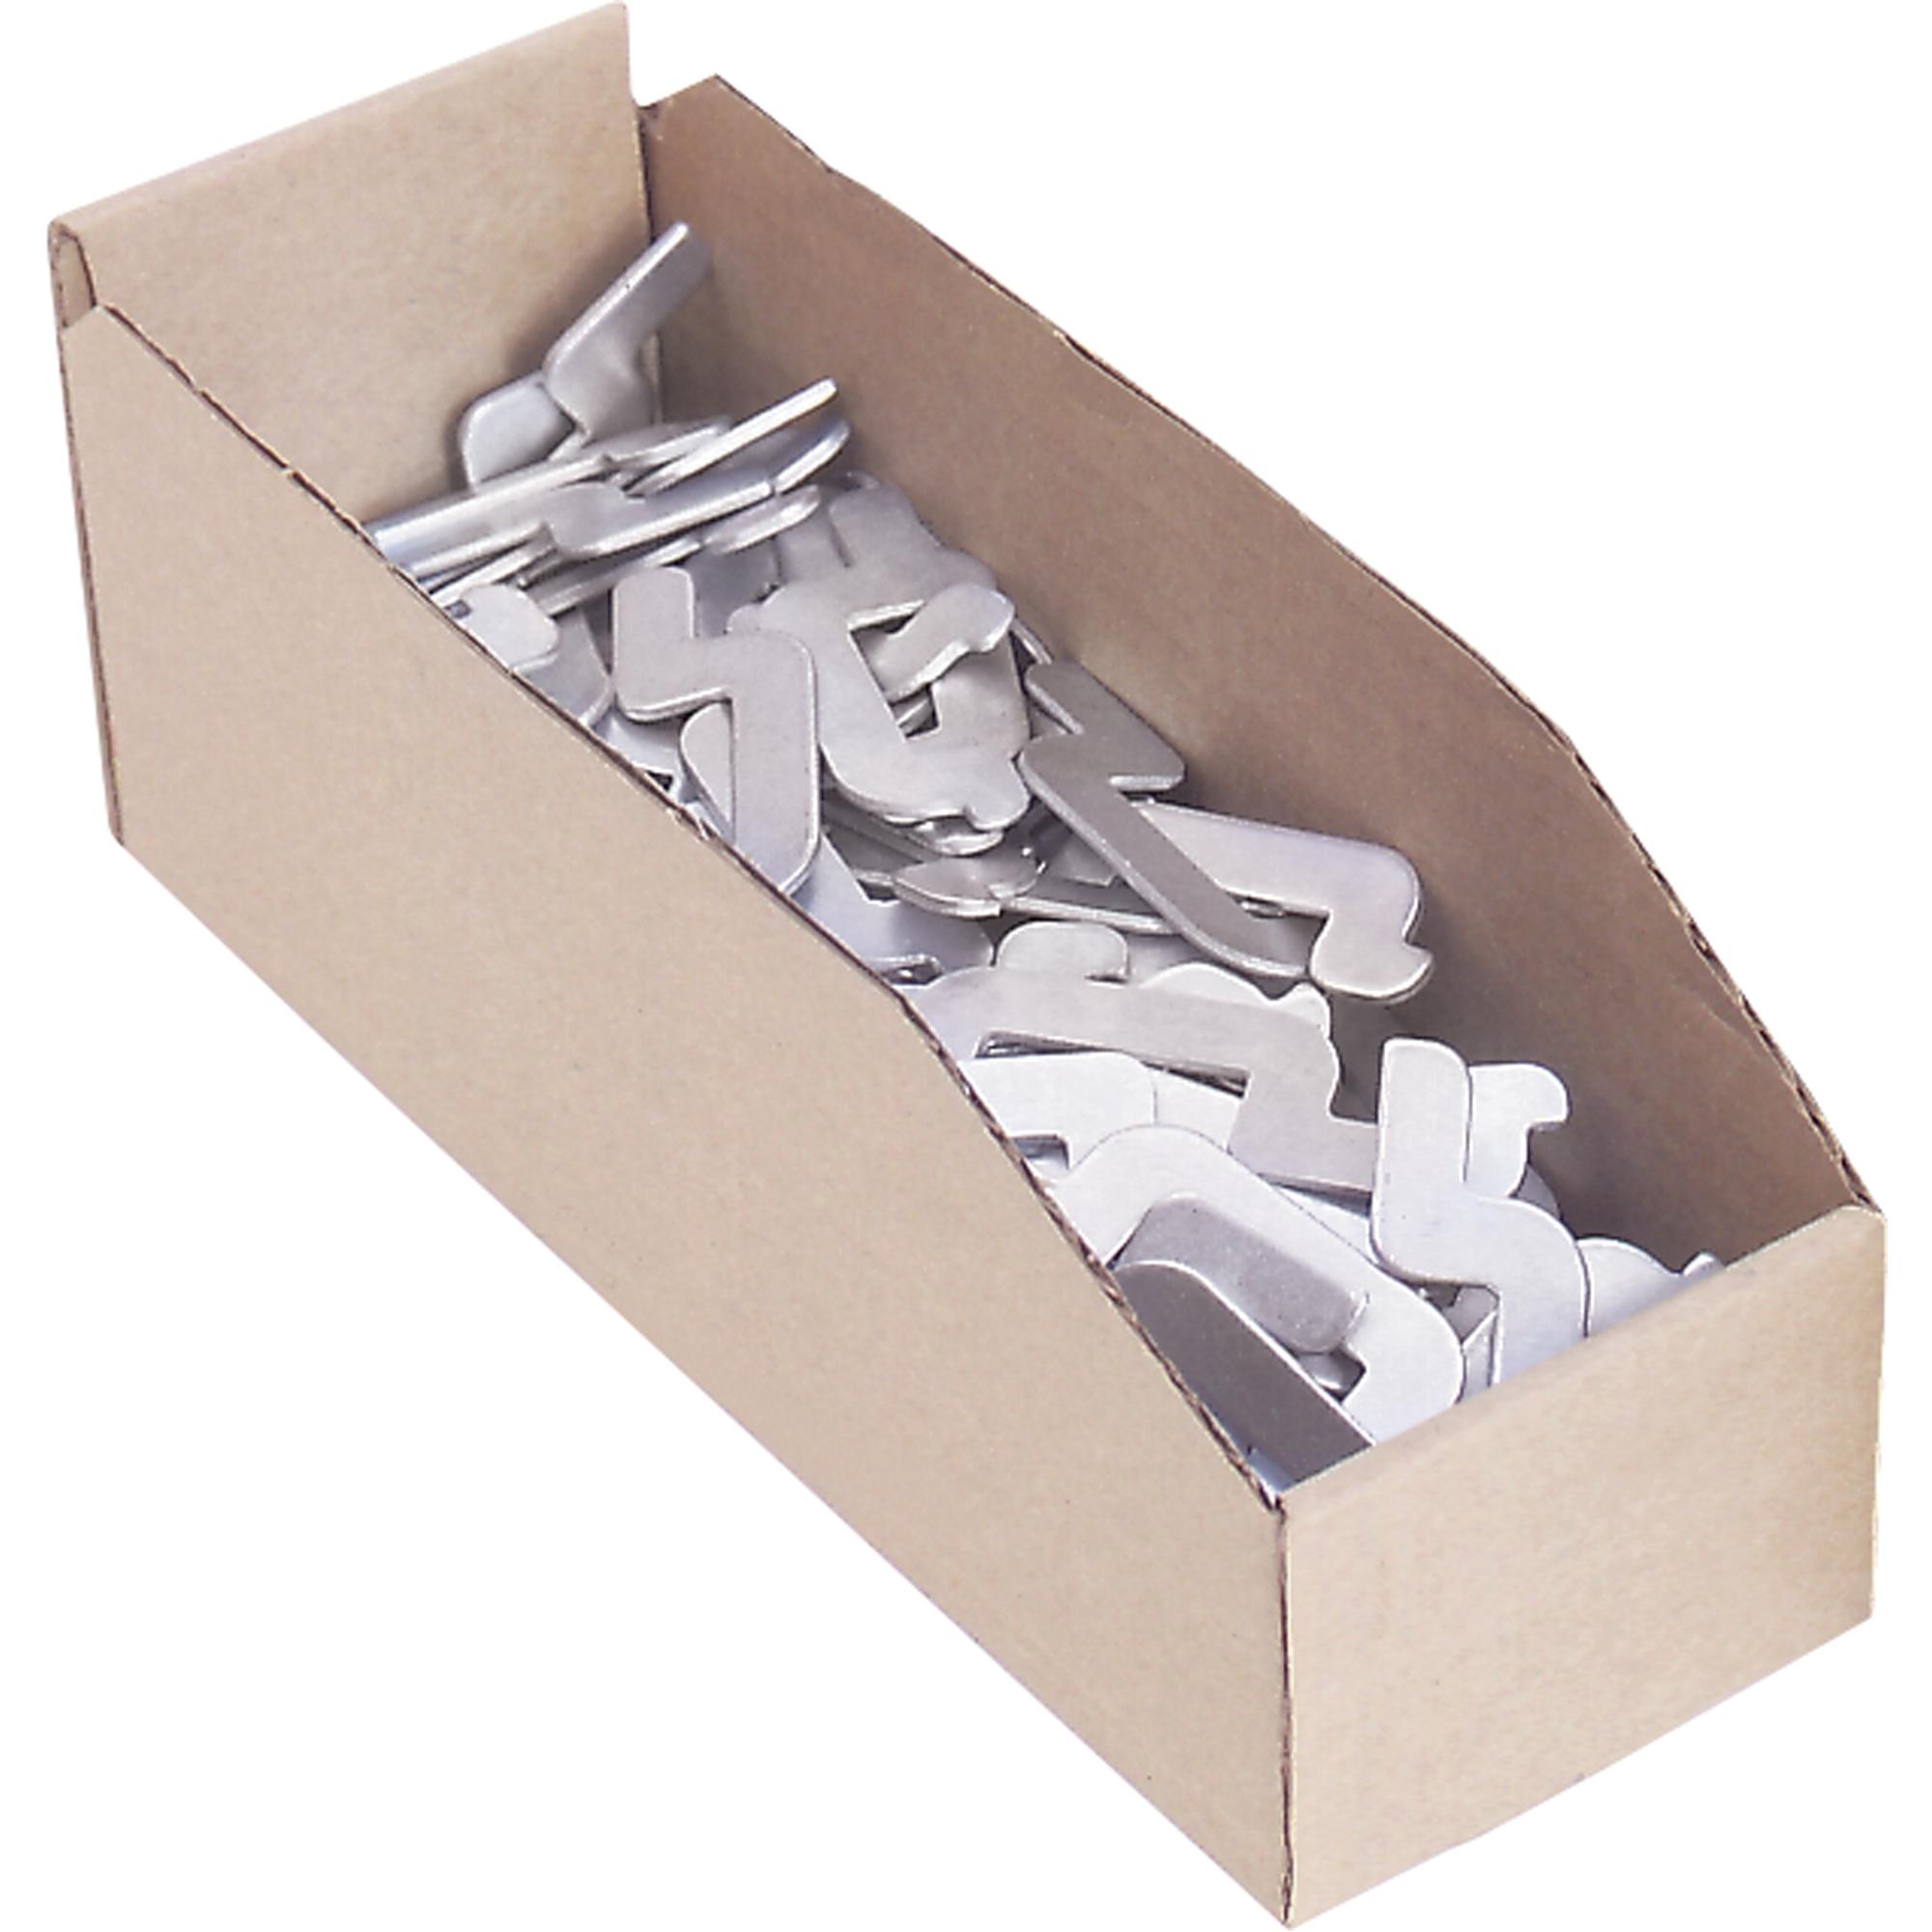 "Cardinal Boxes 12"" Deep Corrugated Parts Bins, 10"" W x 12"" D x 4-1/2"" H, Beige"